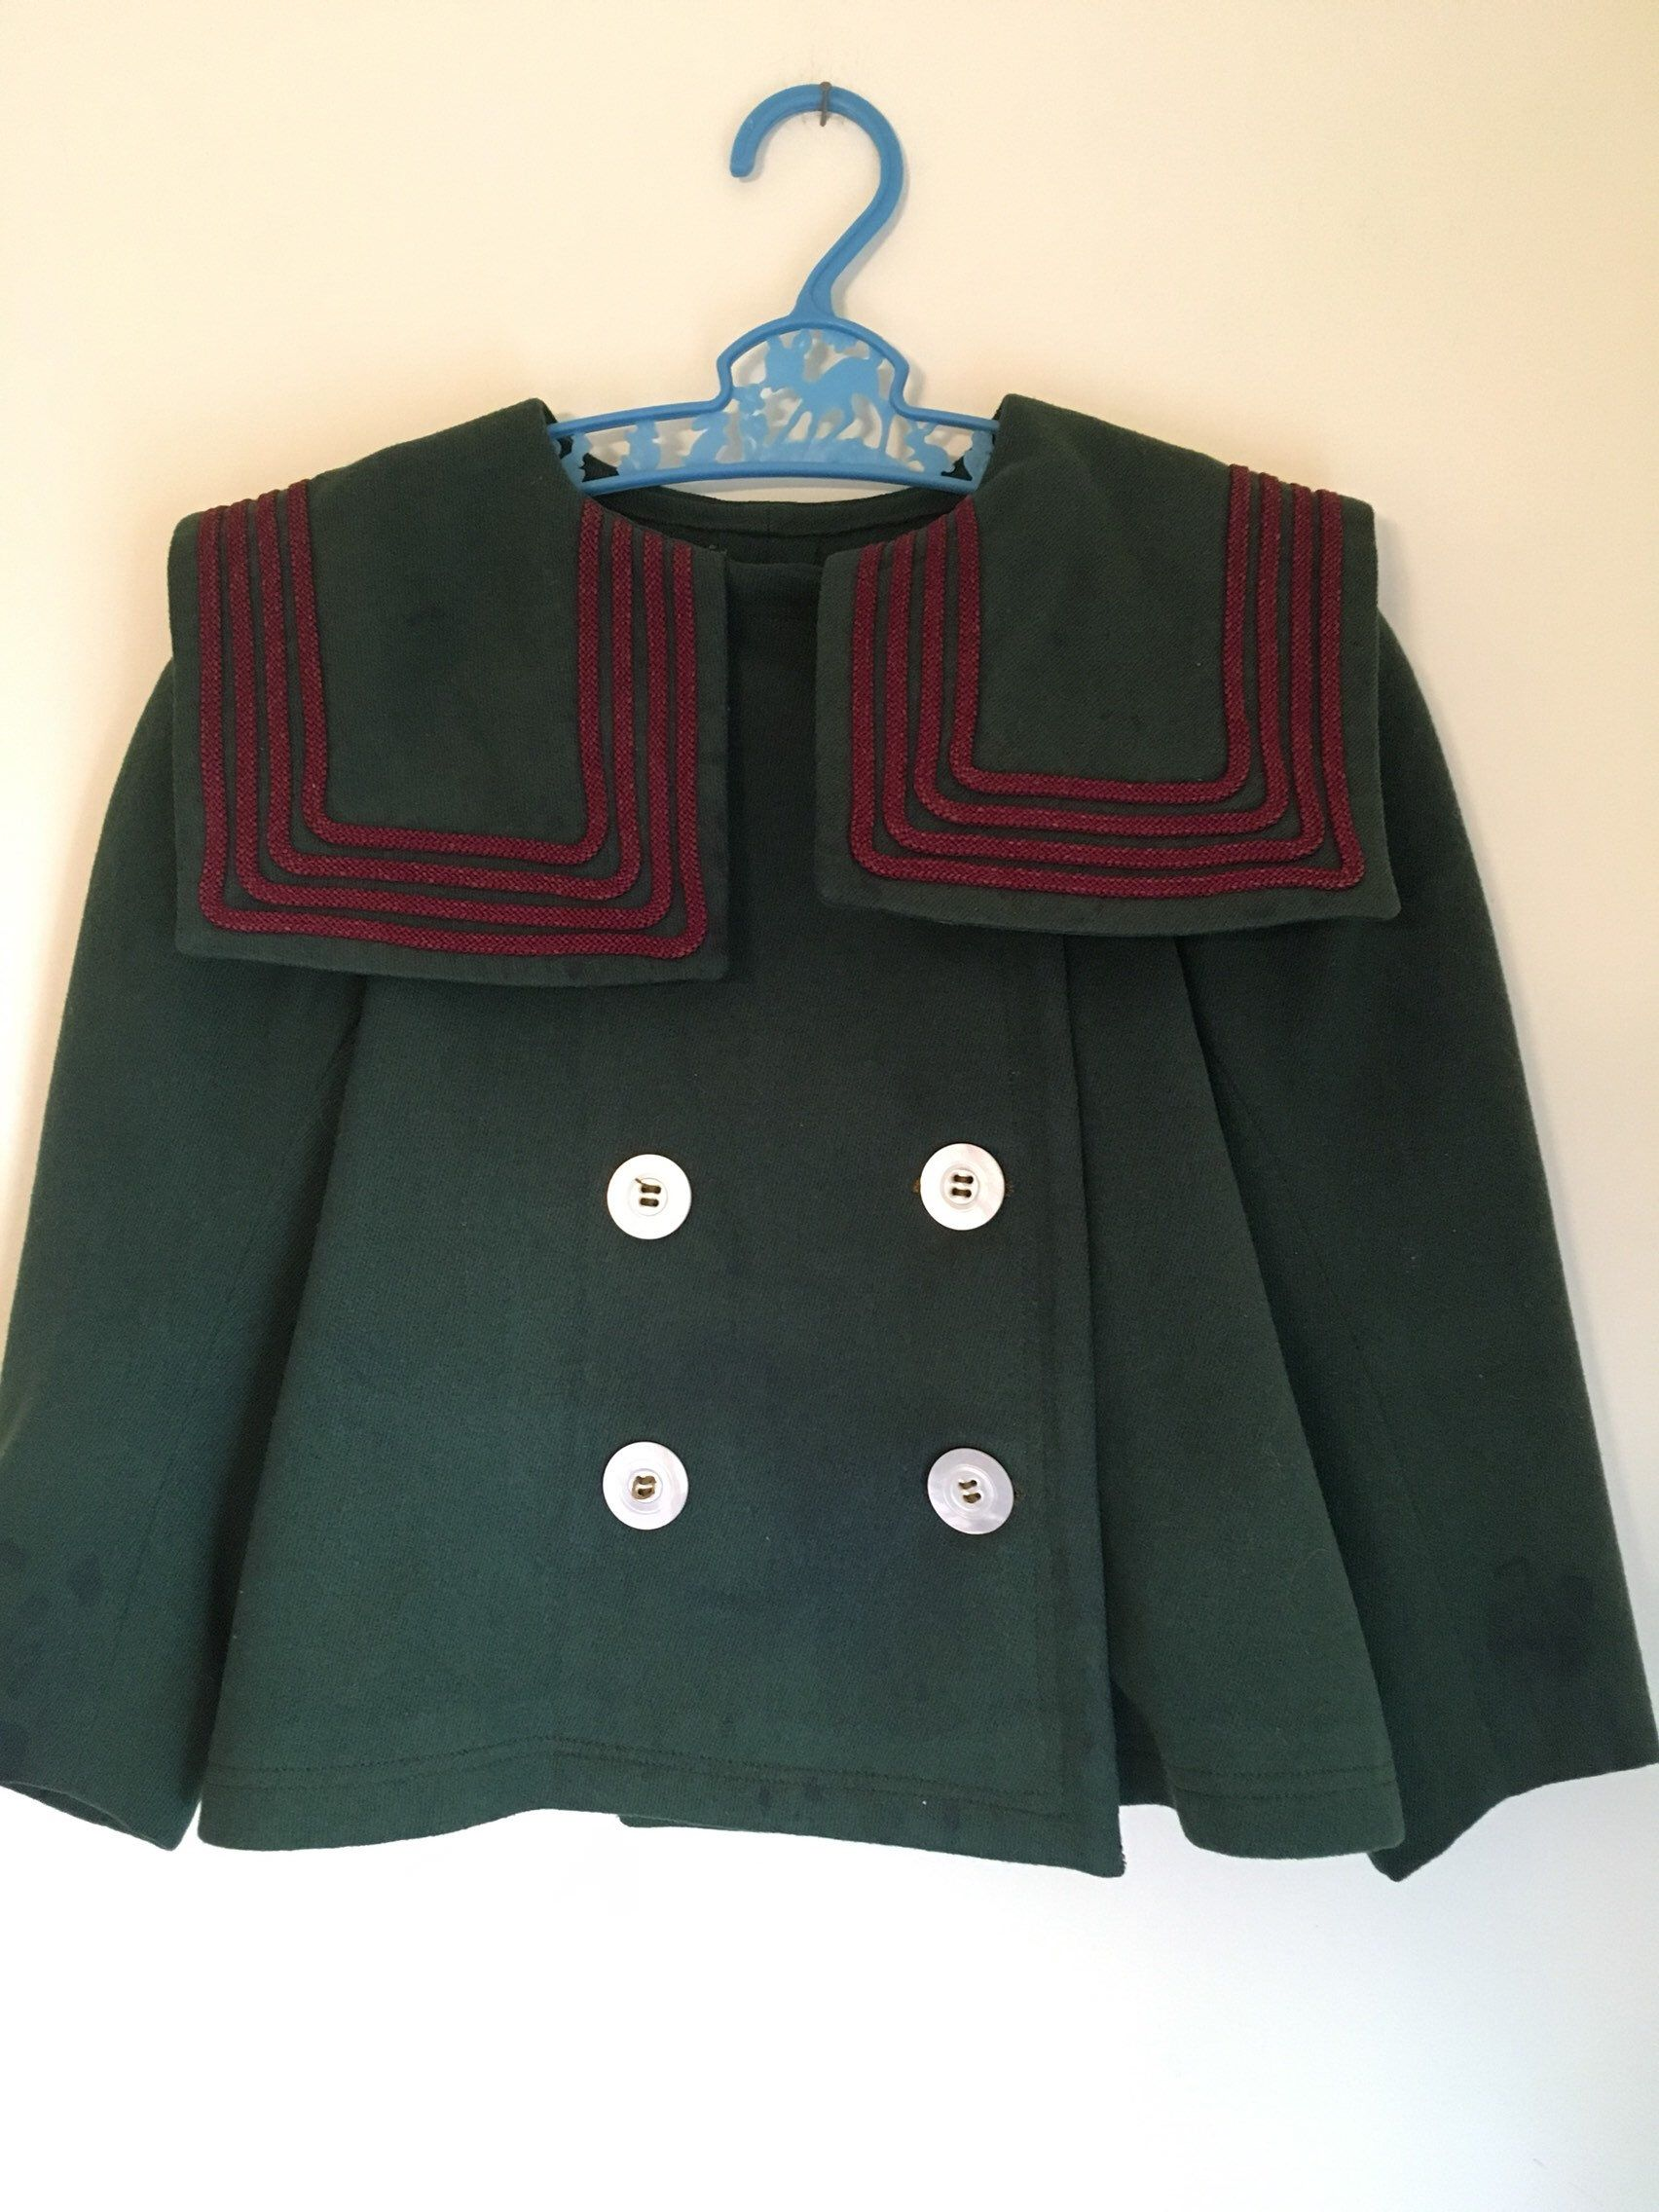 015ca0d86 3t 4t Vintage kids jacket